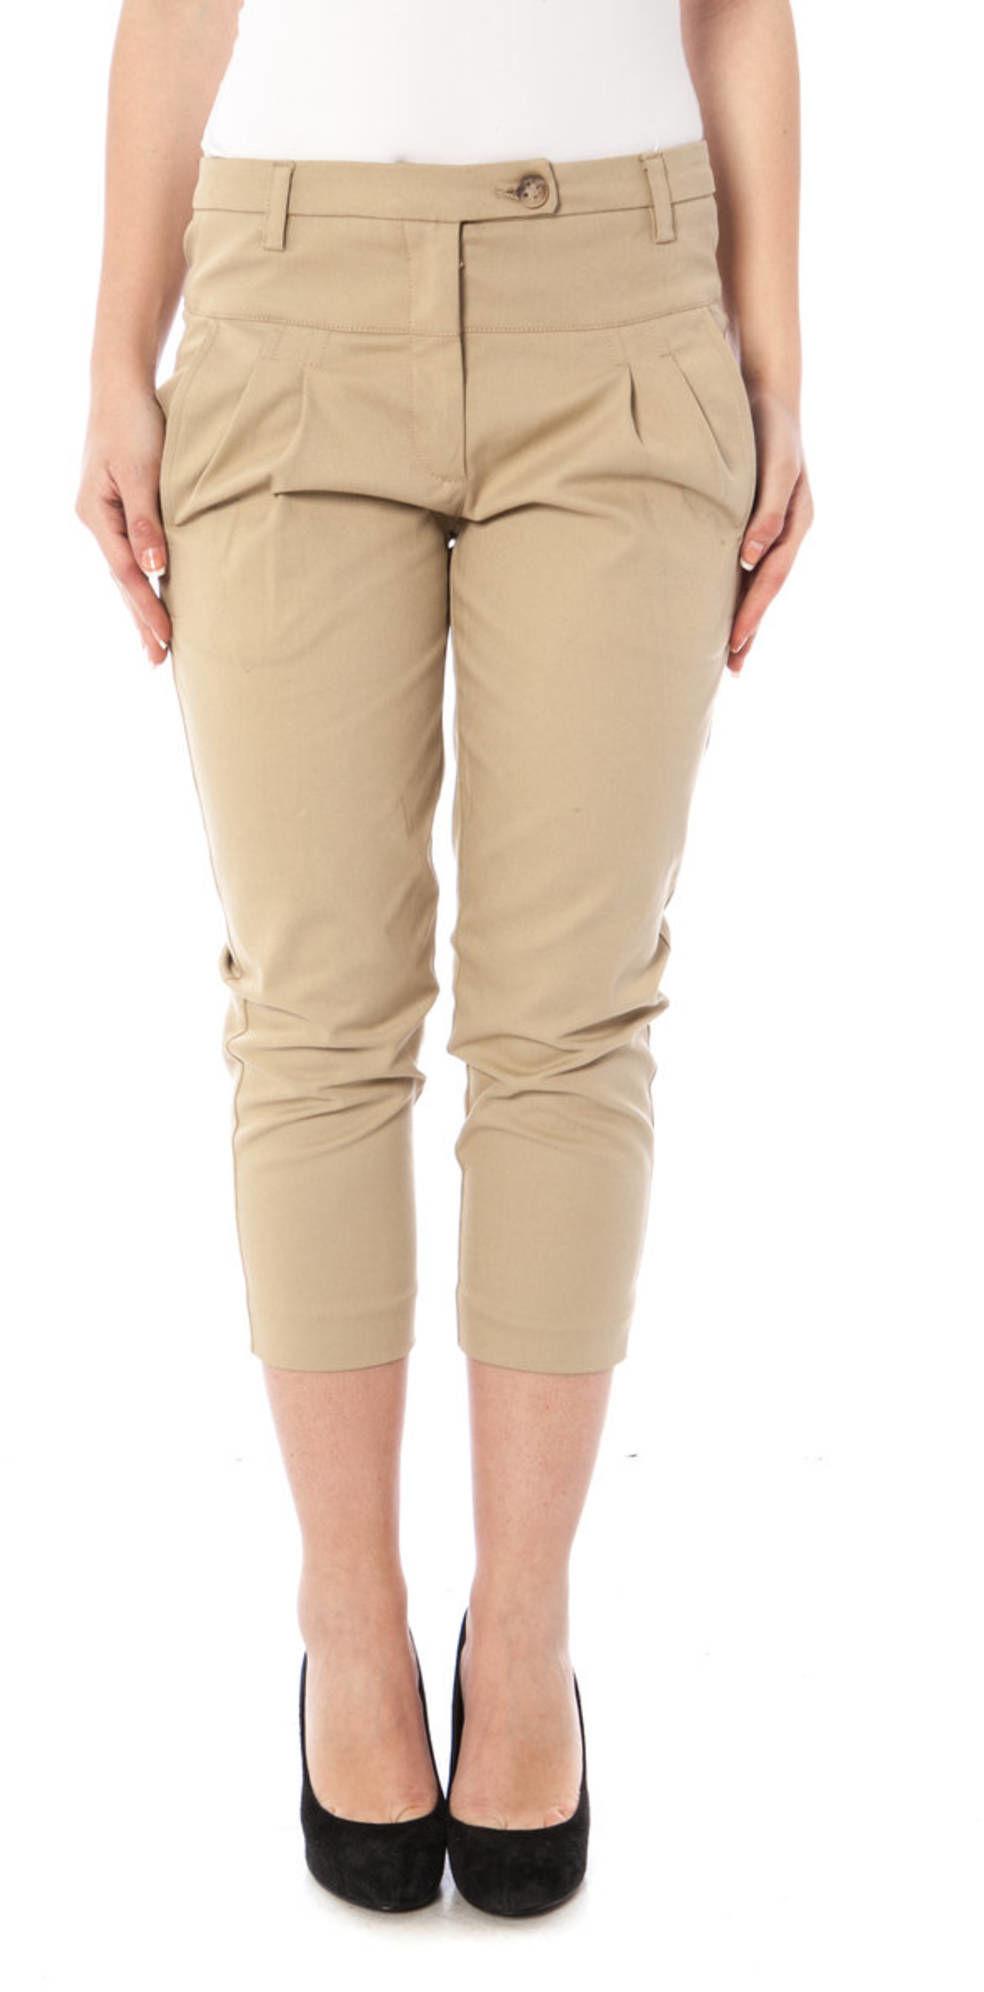 TOY G. Capri trousers Women